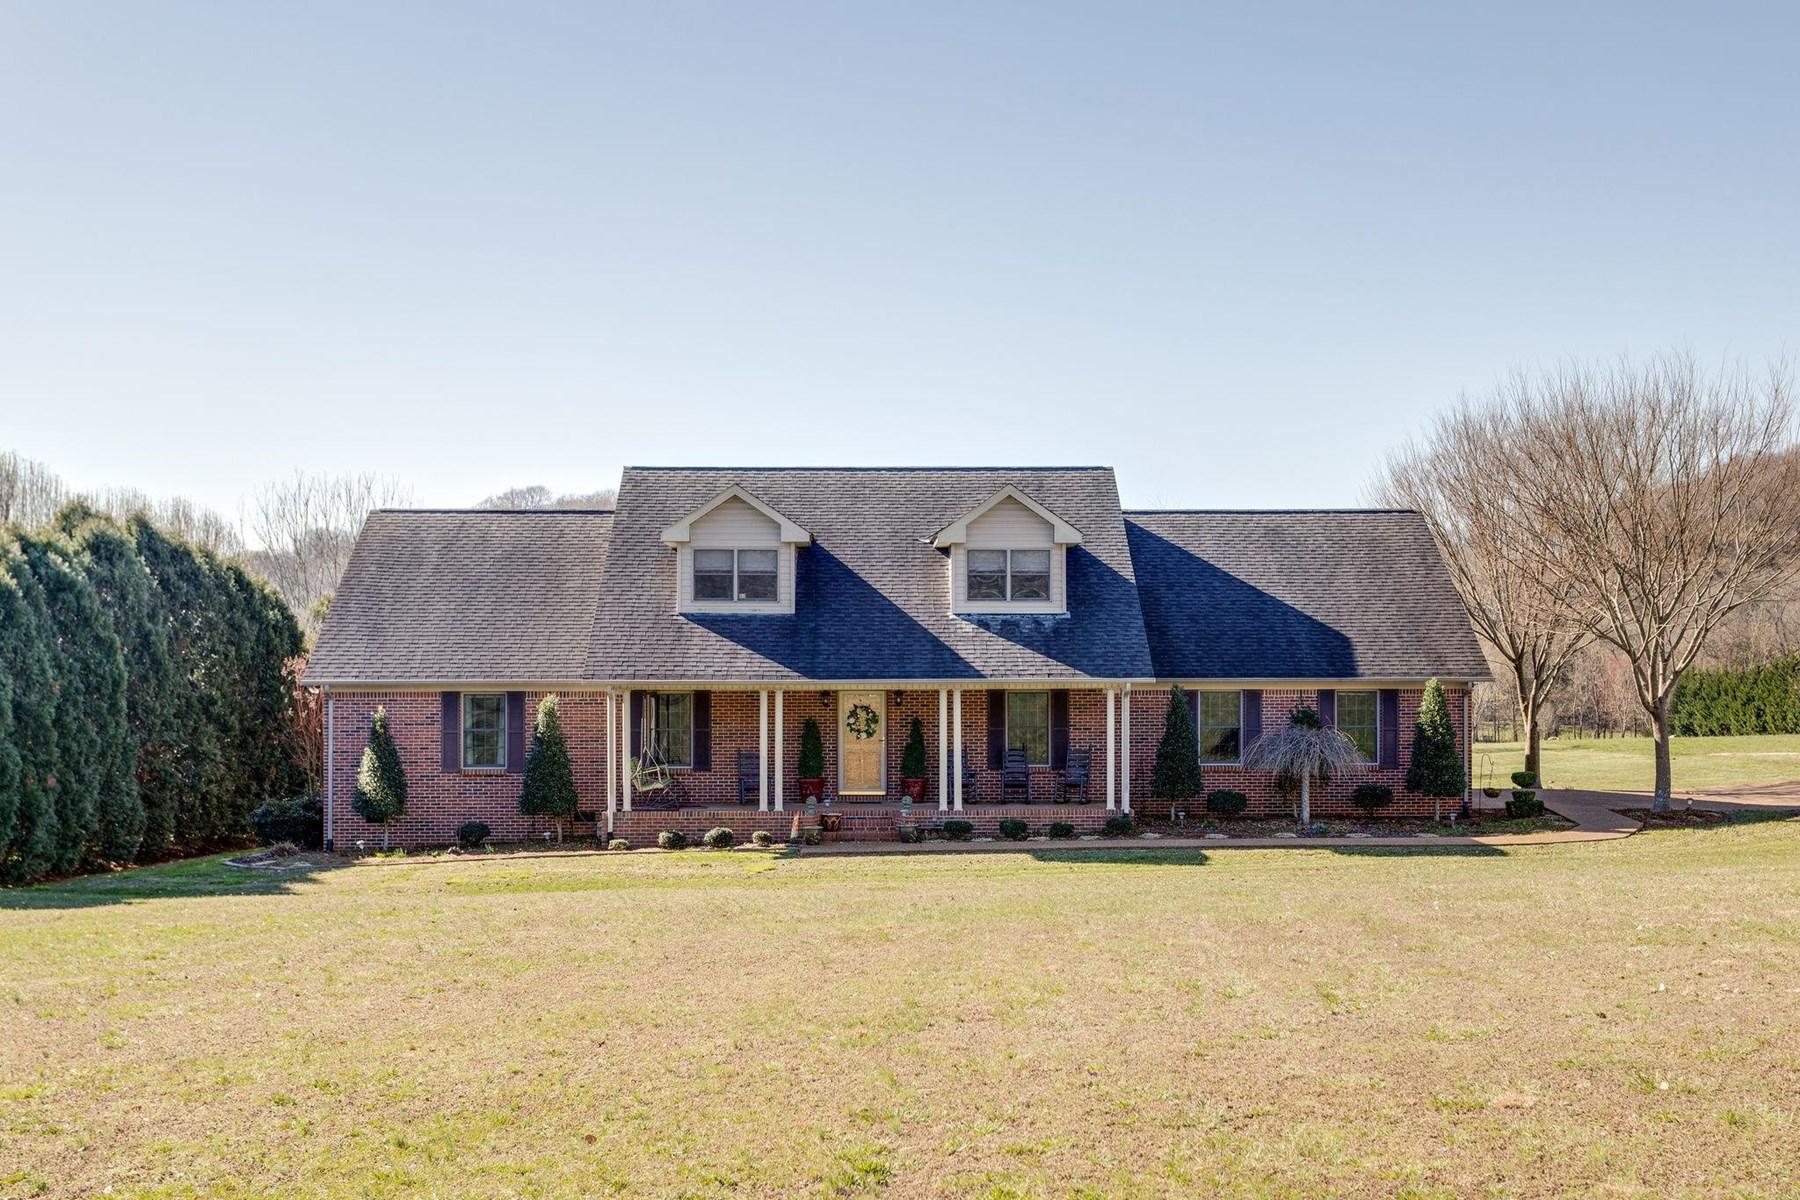 Country home w/ acreage, Maury County, Culleoka, TN